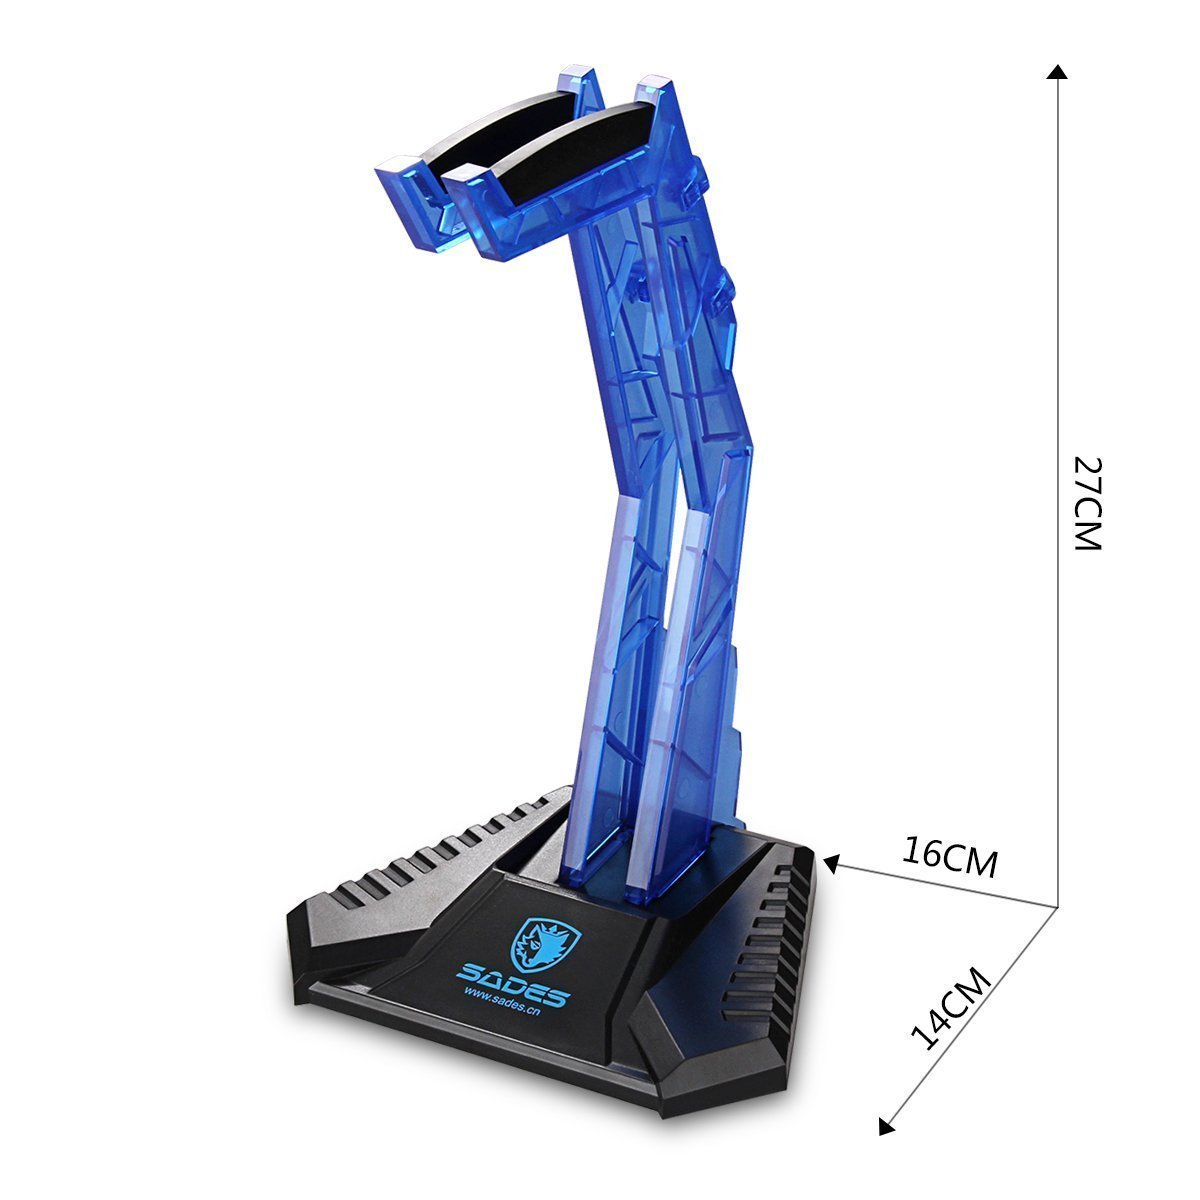 Sades S-xlyz Gaming Headset Cradle Acrylic Bracket Stand Head-mounted Display Rack Headphone Hanger Holder For Gamers (Blue)